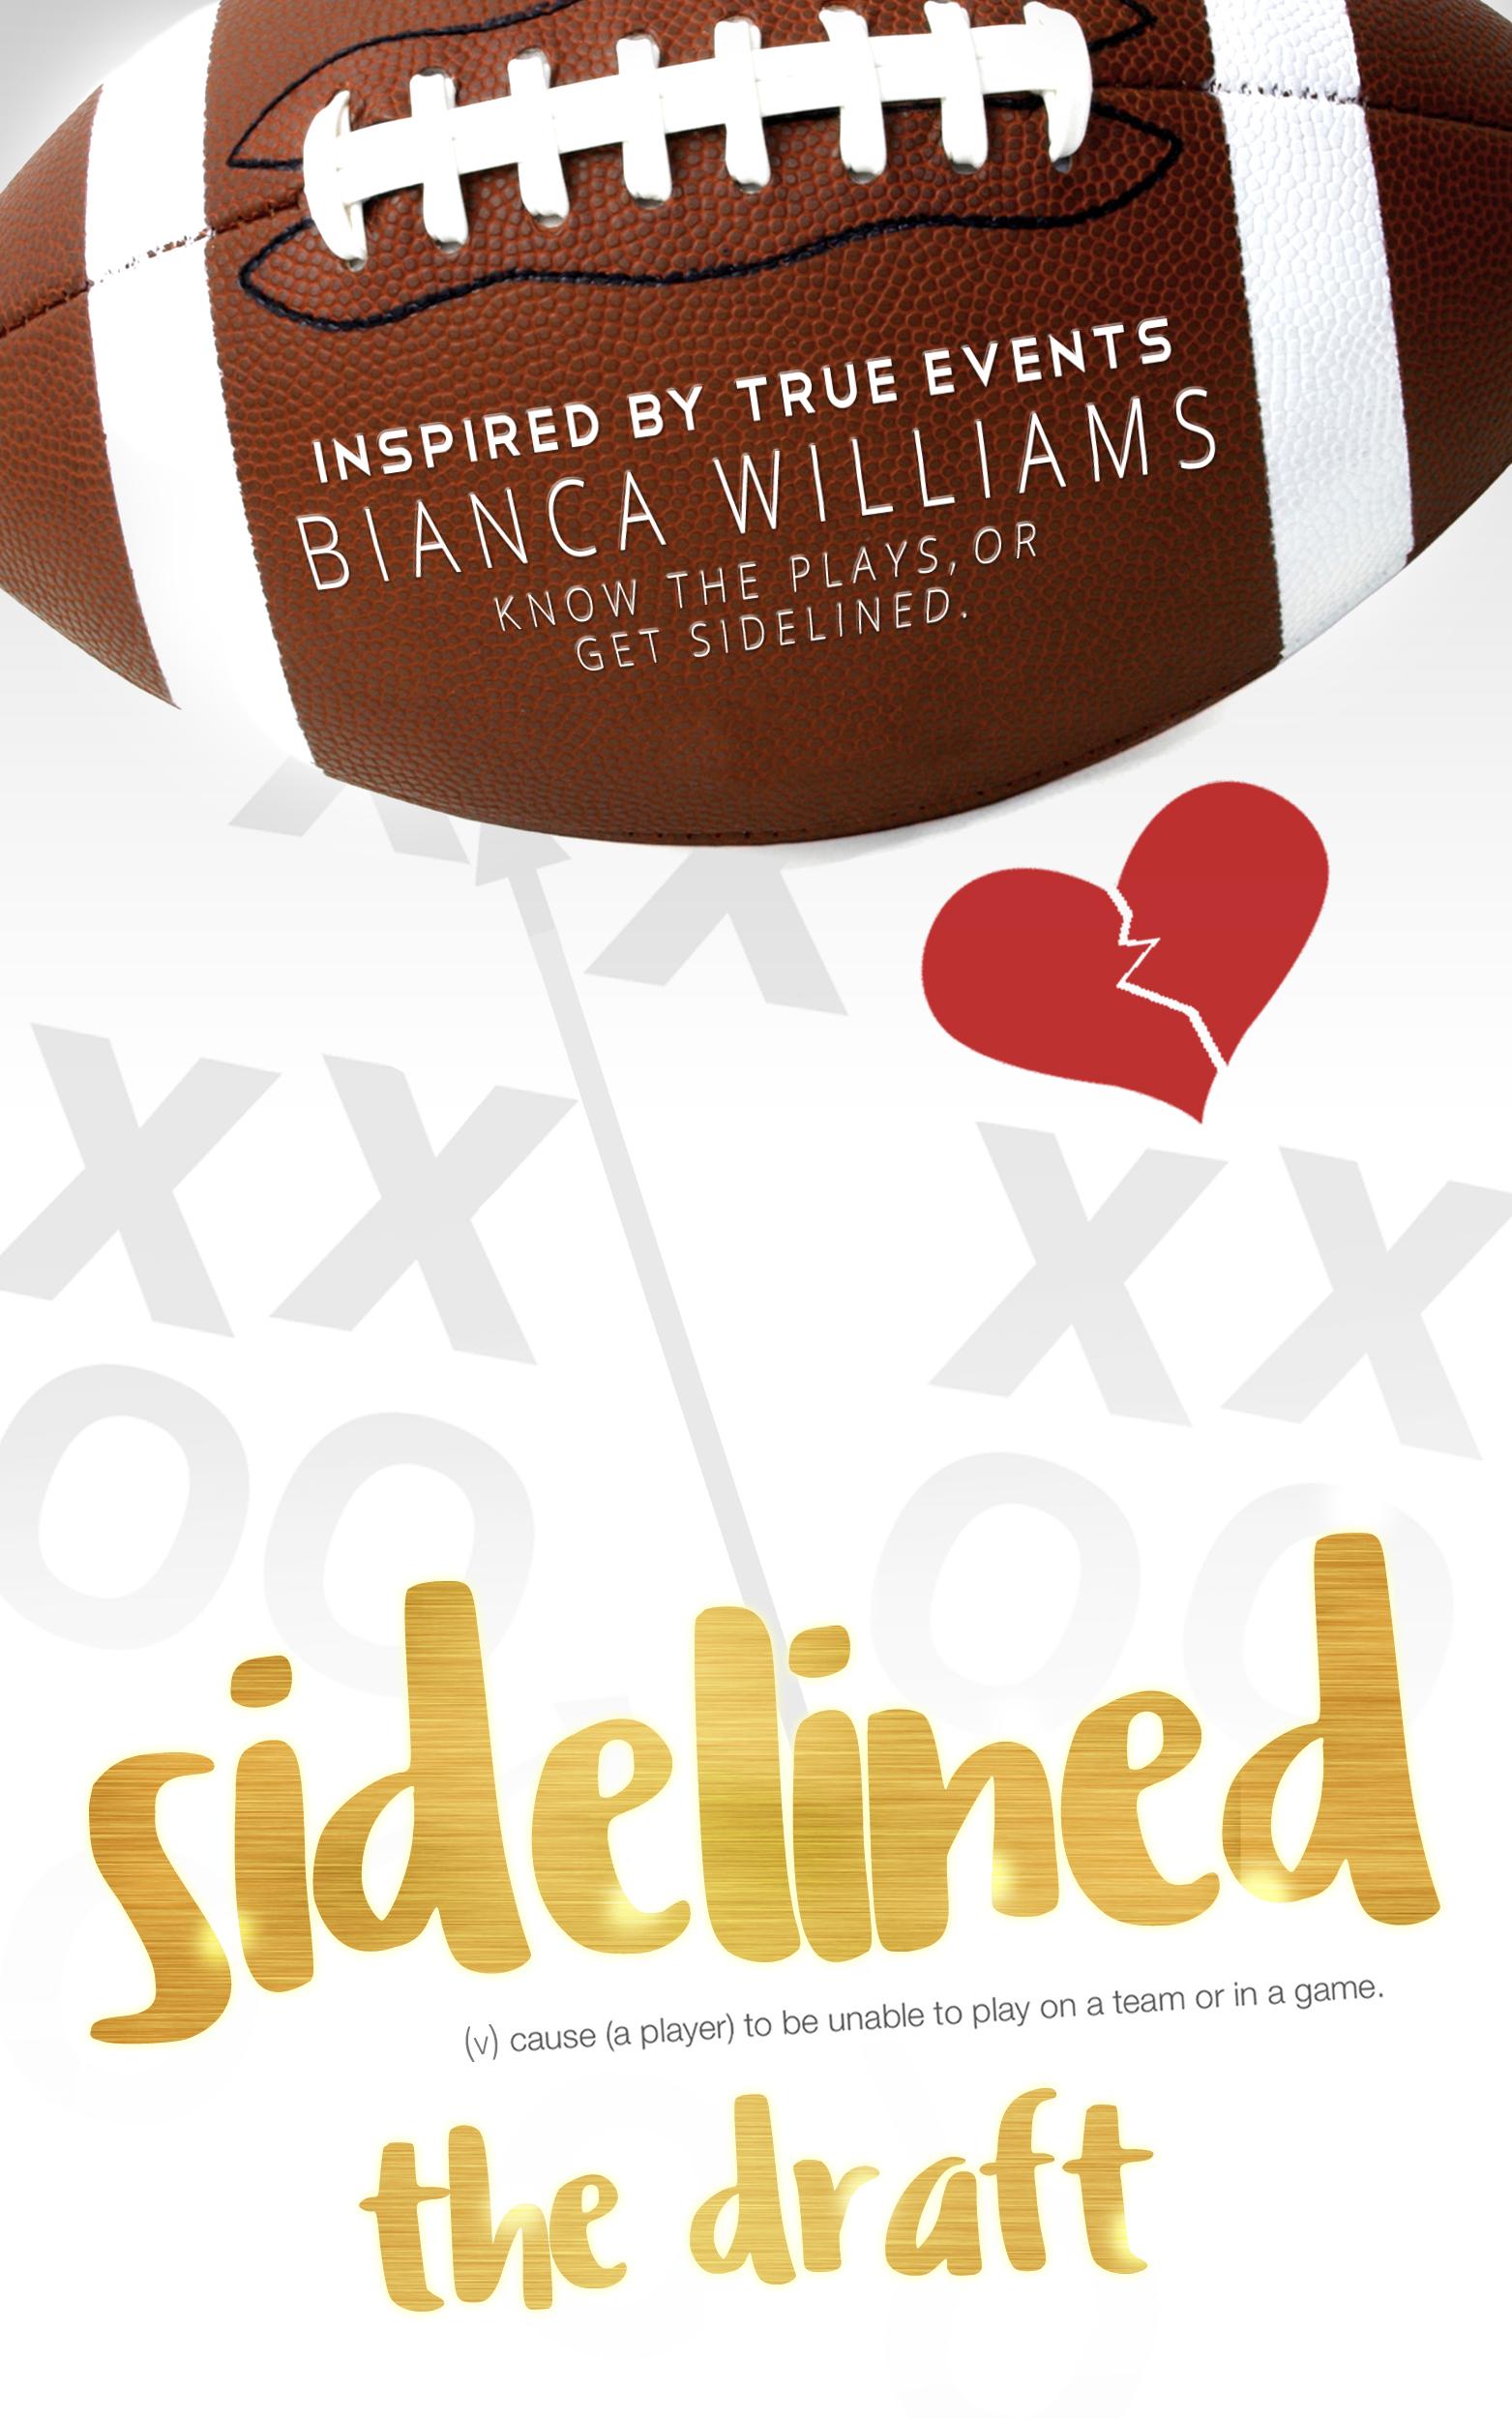 BiancaWilliams (1).jpg